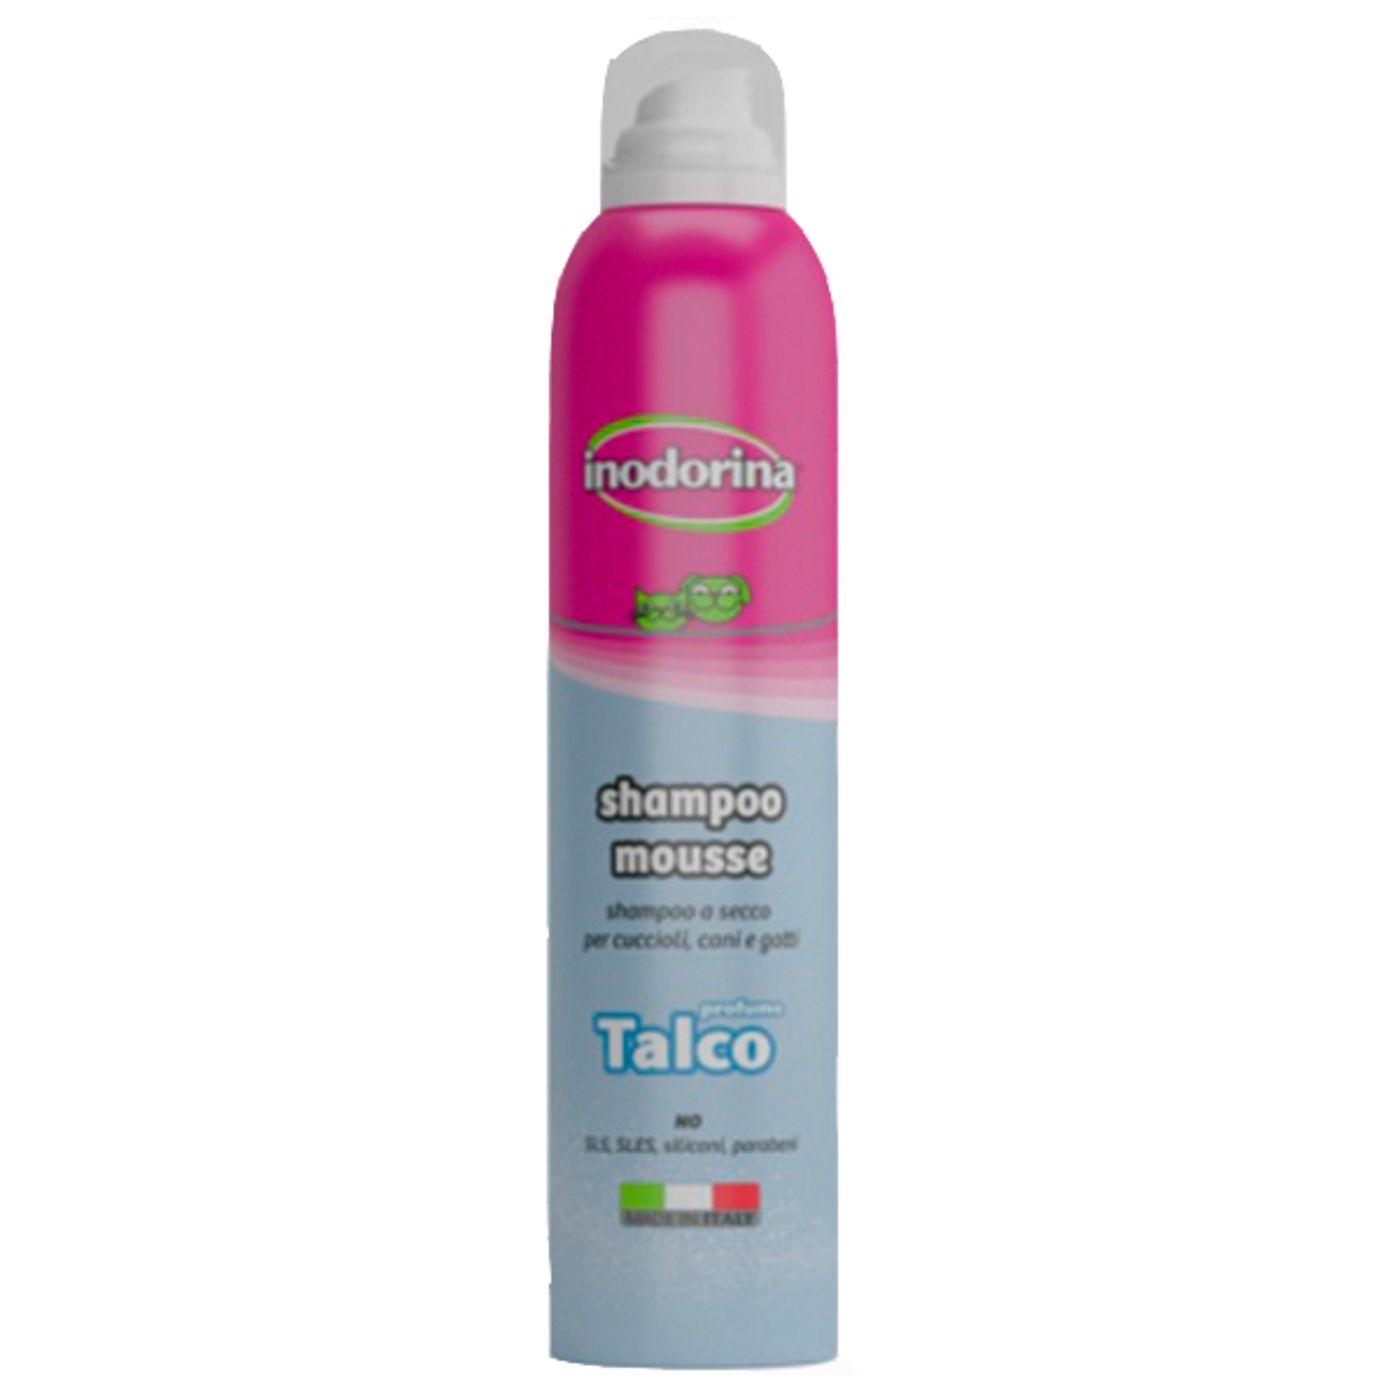 Inodorina-Champo-Mousse-Talco-300-ml